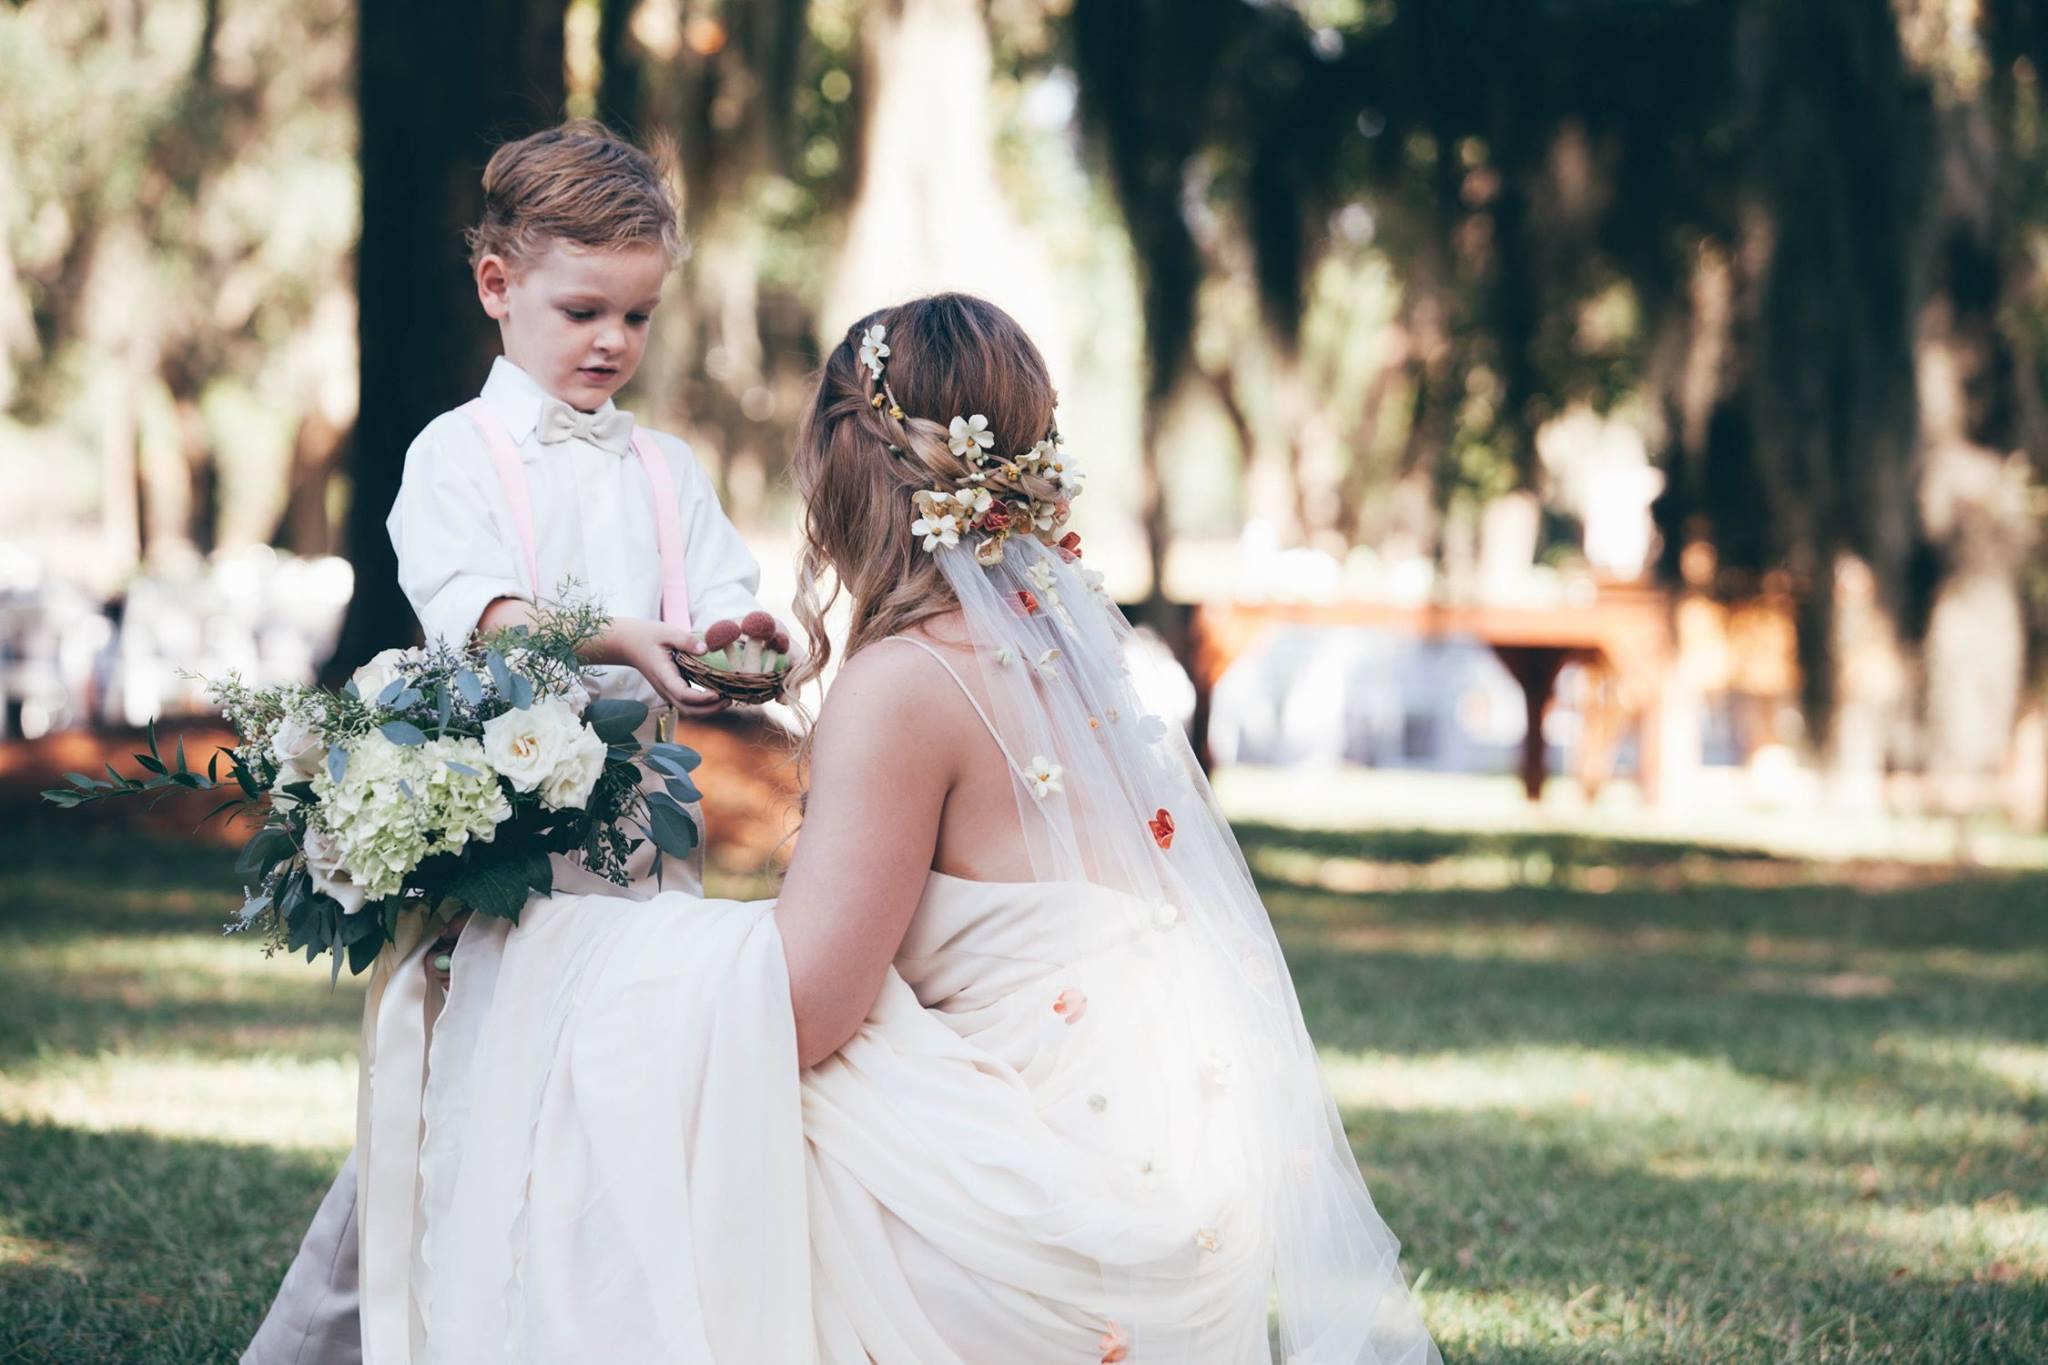 lindy-garvin-rebecca-schoneveld-vivian-sage-blush-wedding-dress-blush-bridal-gown-handmade-wedding-dress-ivory-and-beau-bridal-boutique-savannah-wedding-dresses-savannah-bridal-boutique-savannah-weddings-savannah-brides-jacksonville-bridal-boutique-6.jpg